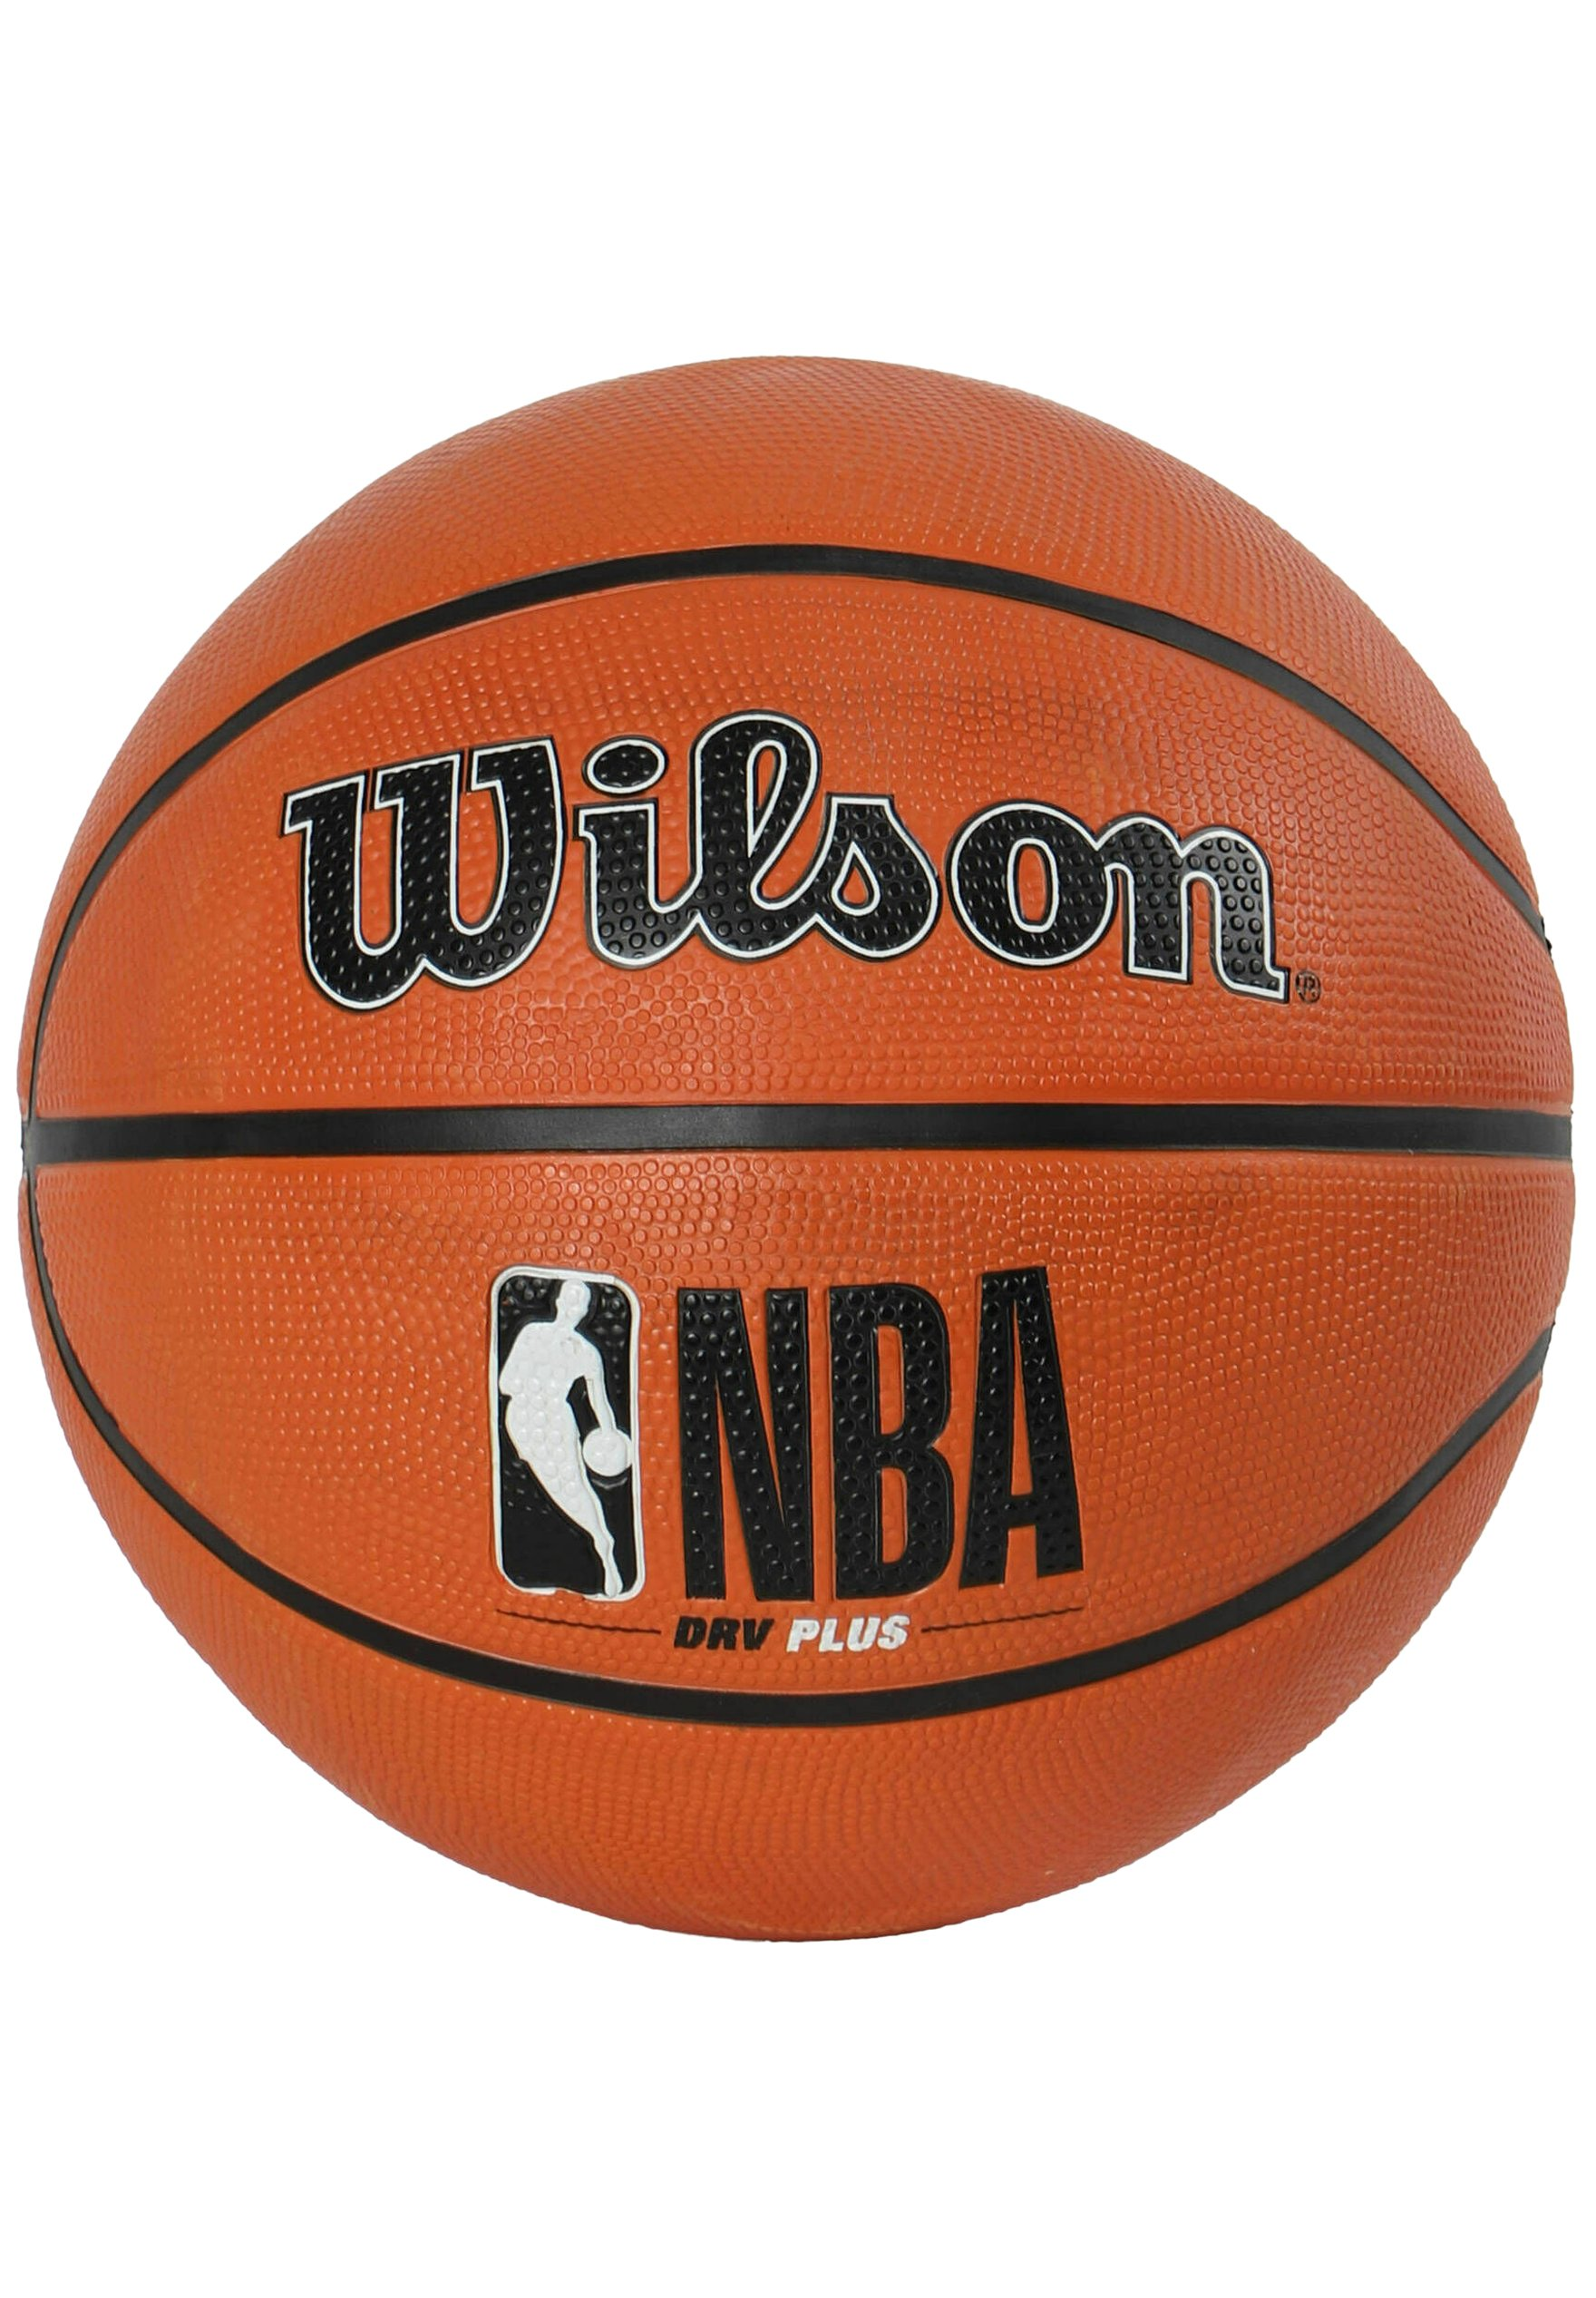 Herren Basketball - braun